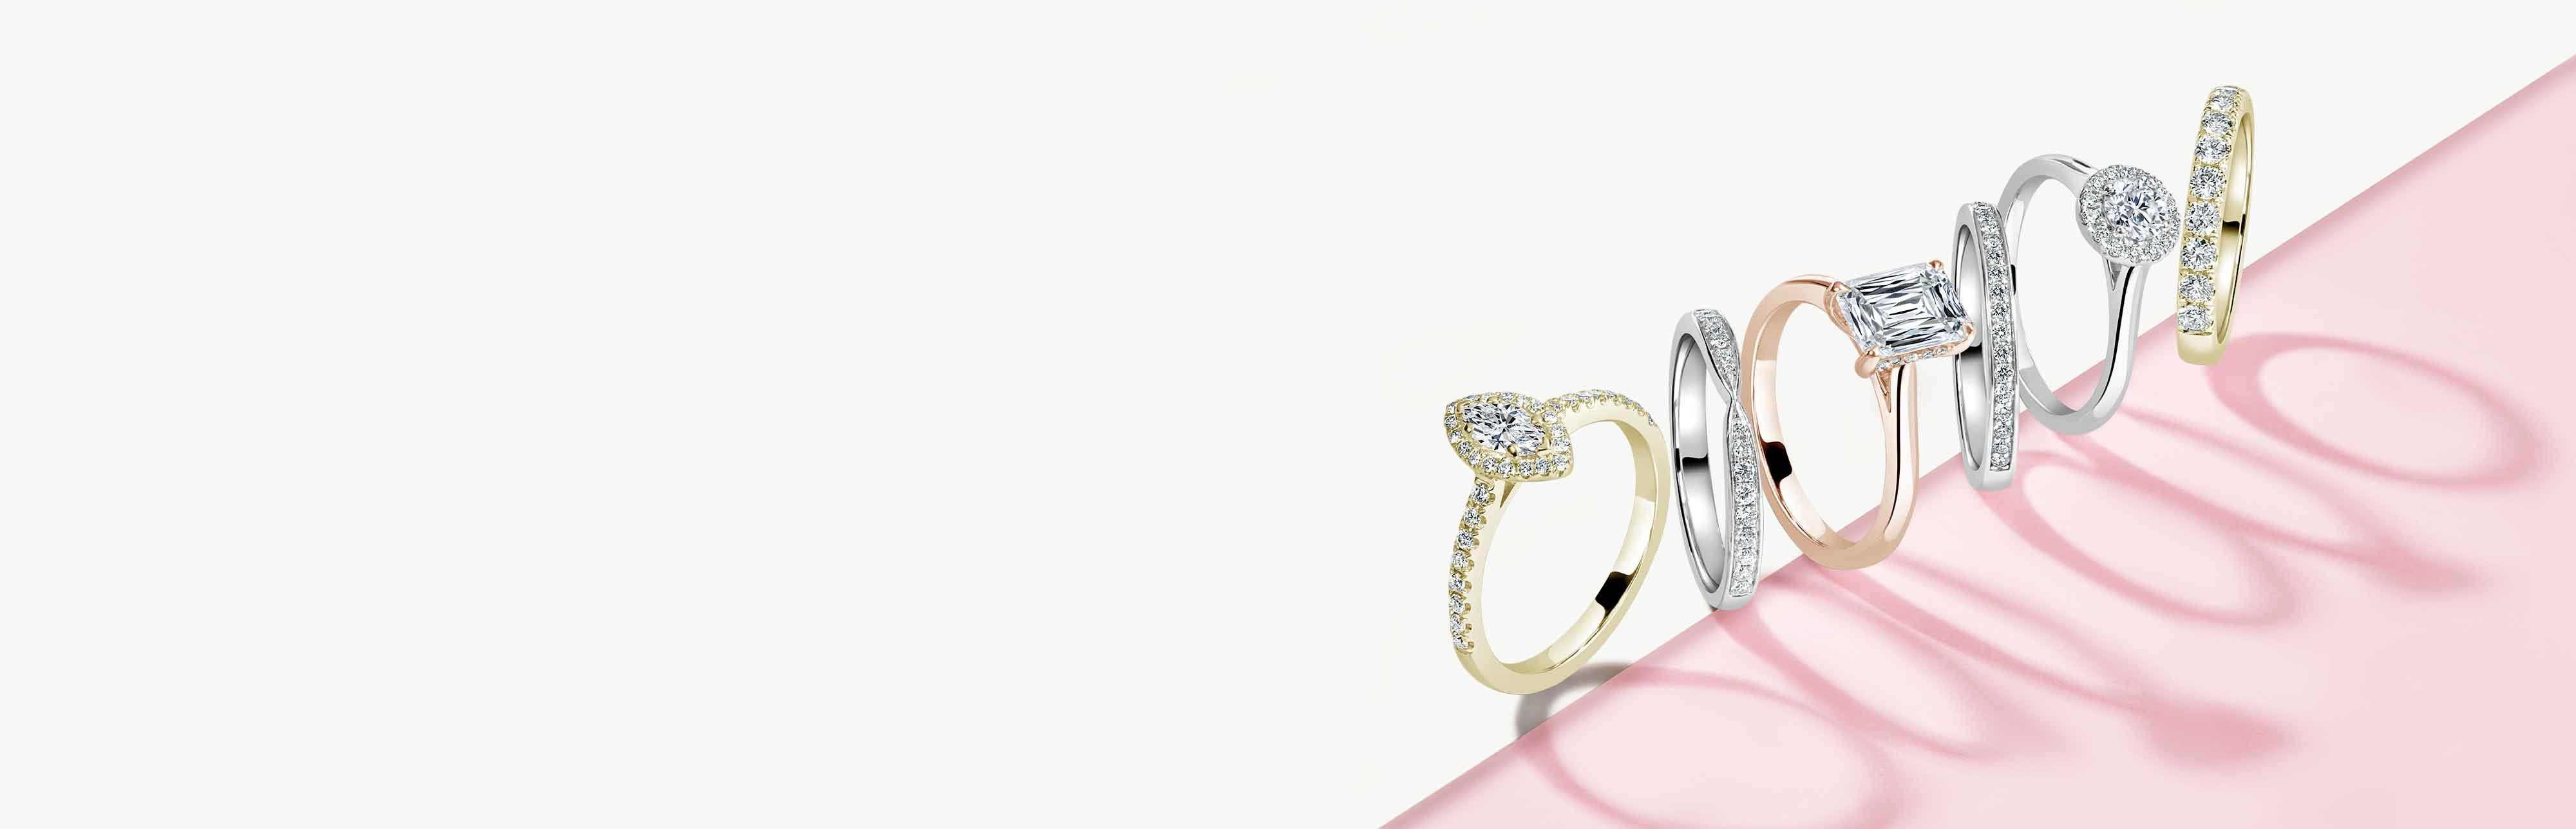 Platinum Shoulder Set Engagement Rings - Steven Stone